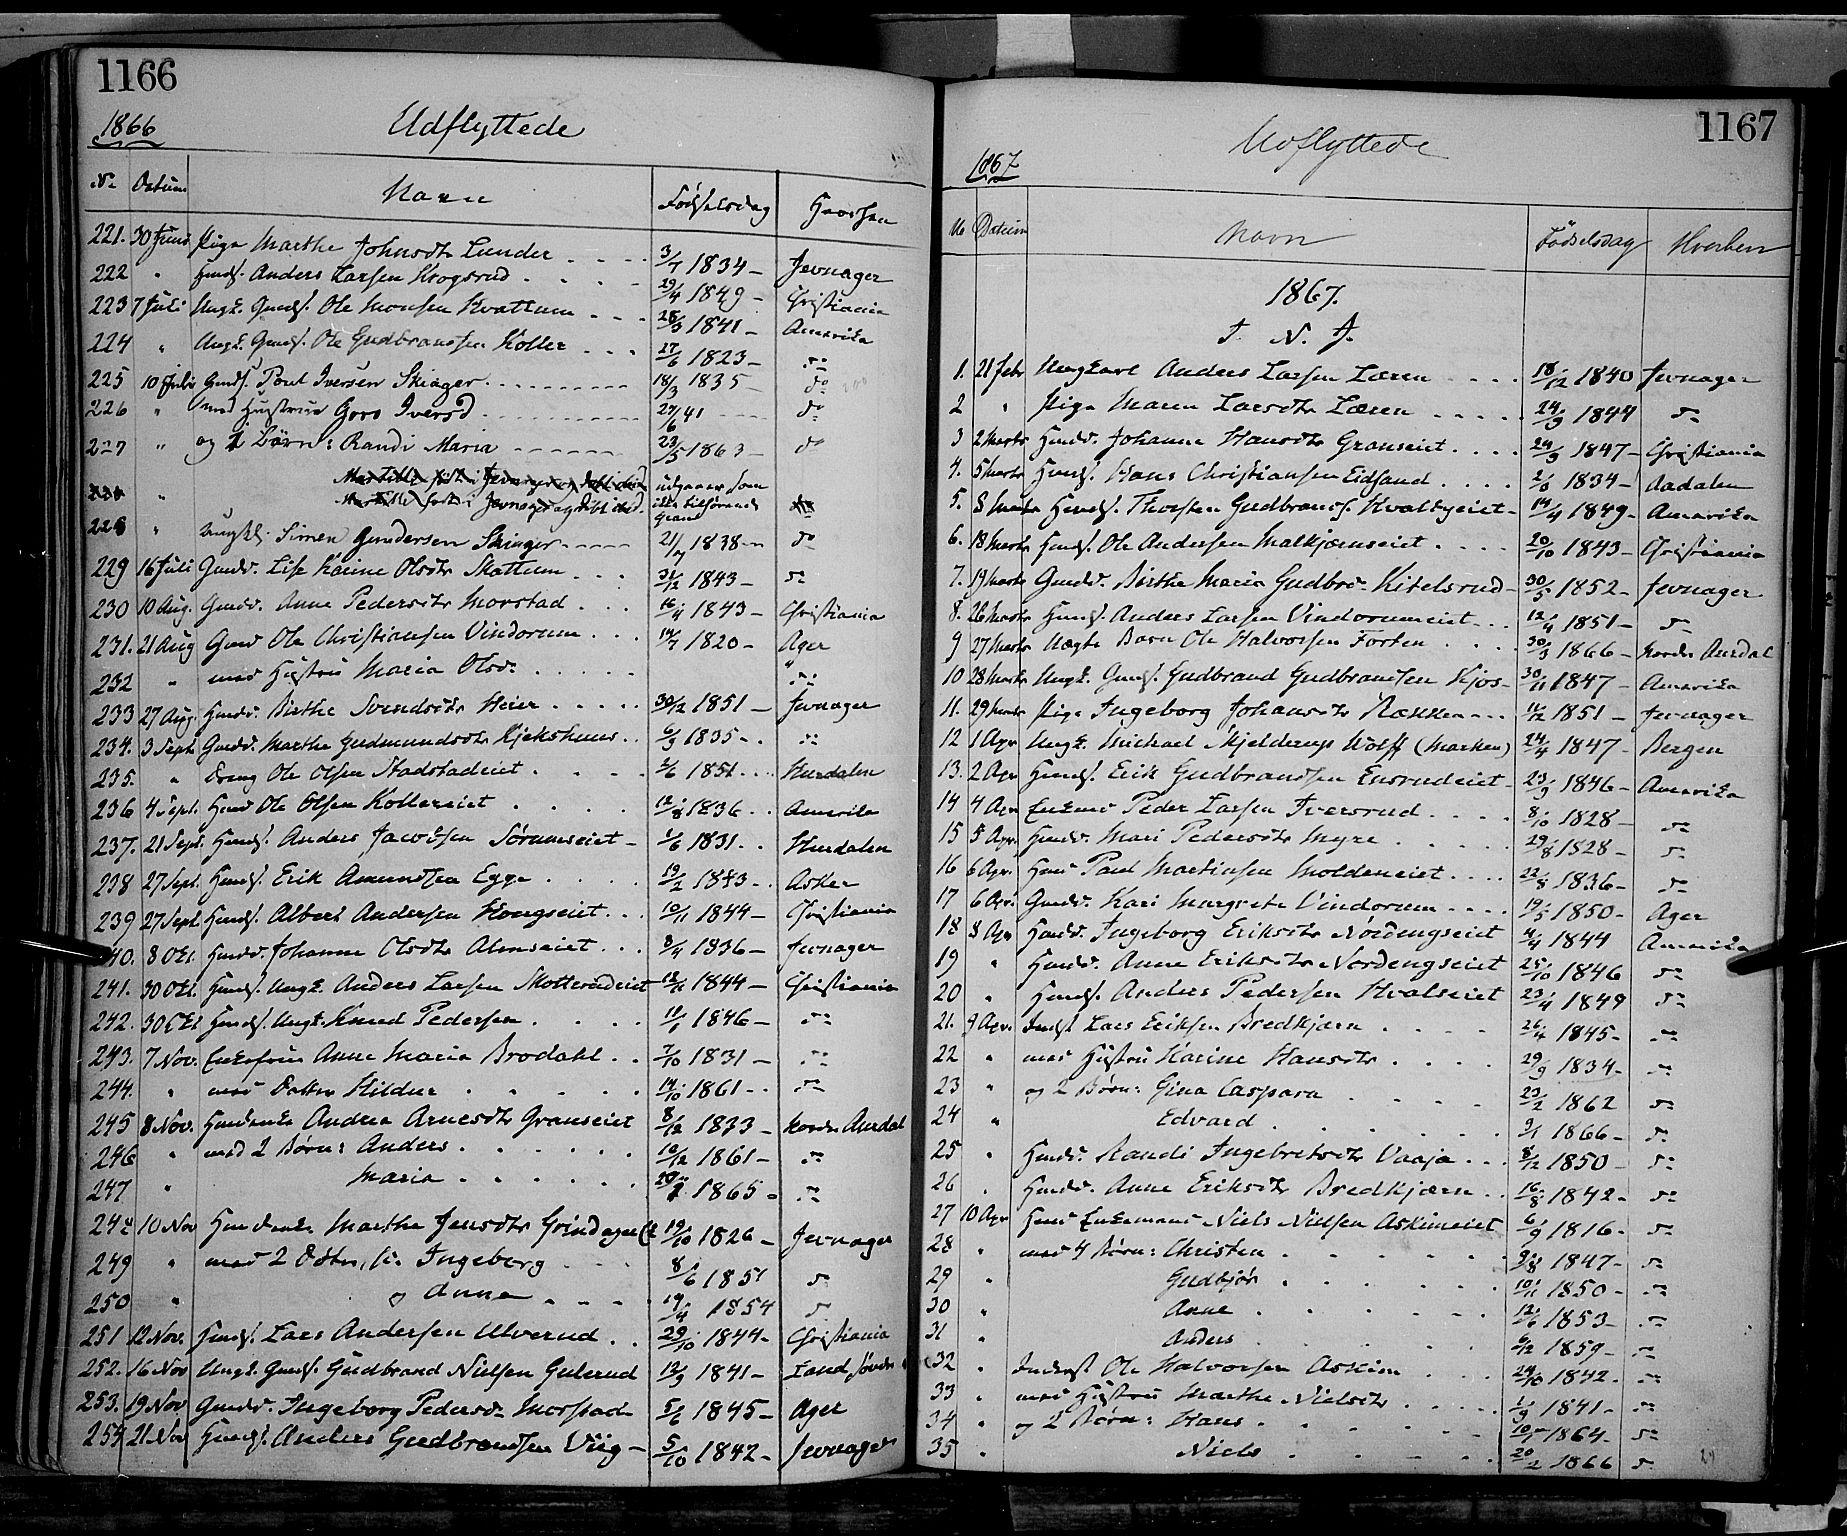 SAH, Gran prestekontor, Ministerialbok nr. 12, 1856-1874, s. 1166-1167